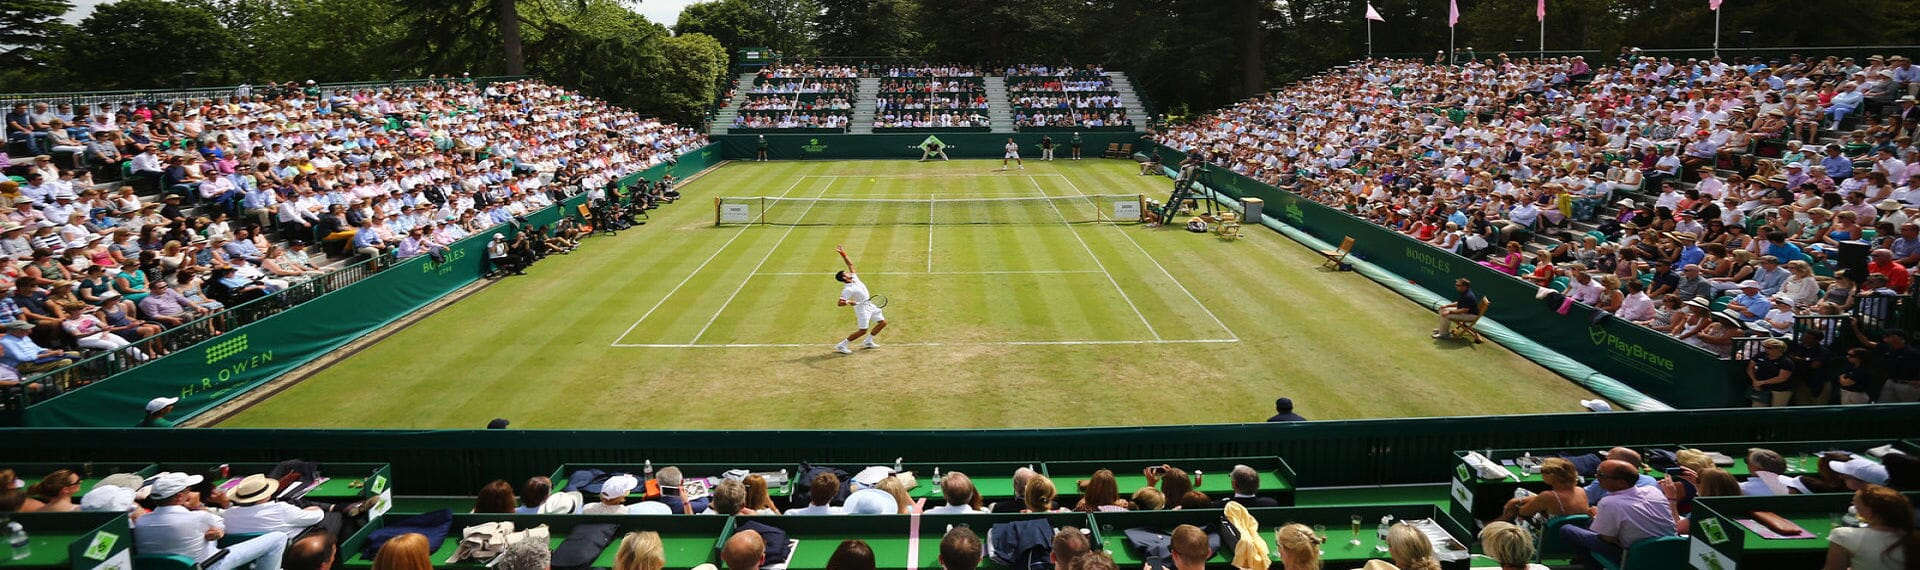 Boodle Tennis VIP Corporate Hospitality Royal Albert Hall Champions Wimbledon ATP Queens Club Fevertree Classic Aegon